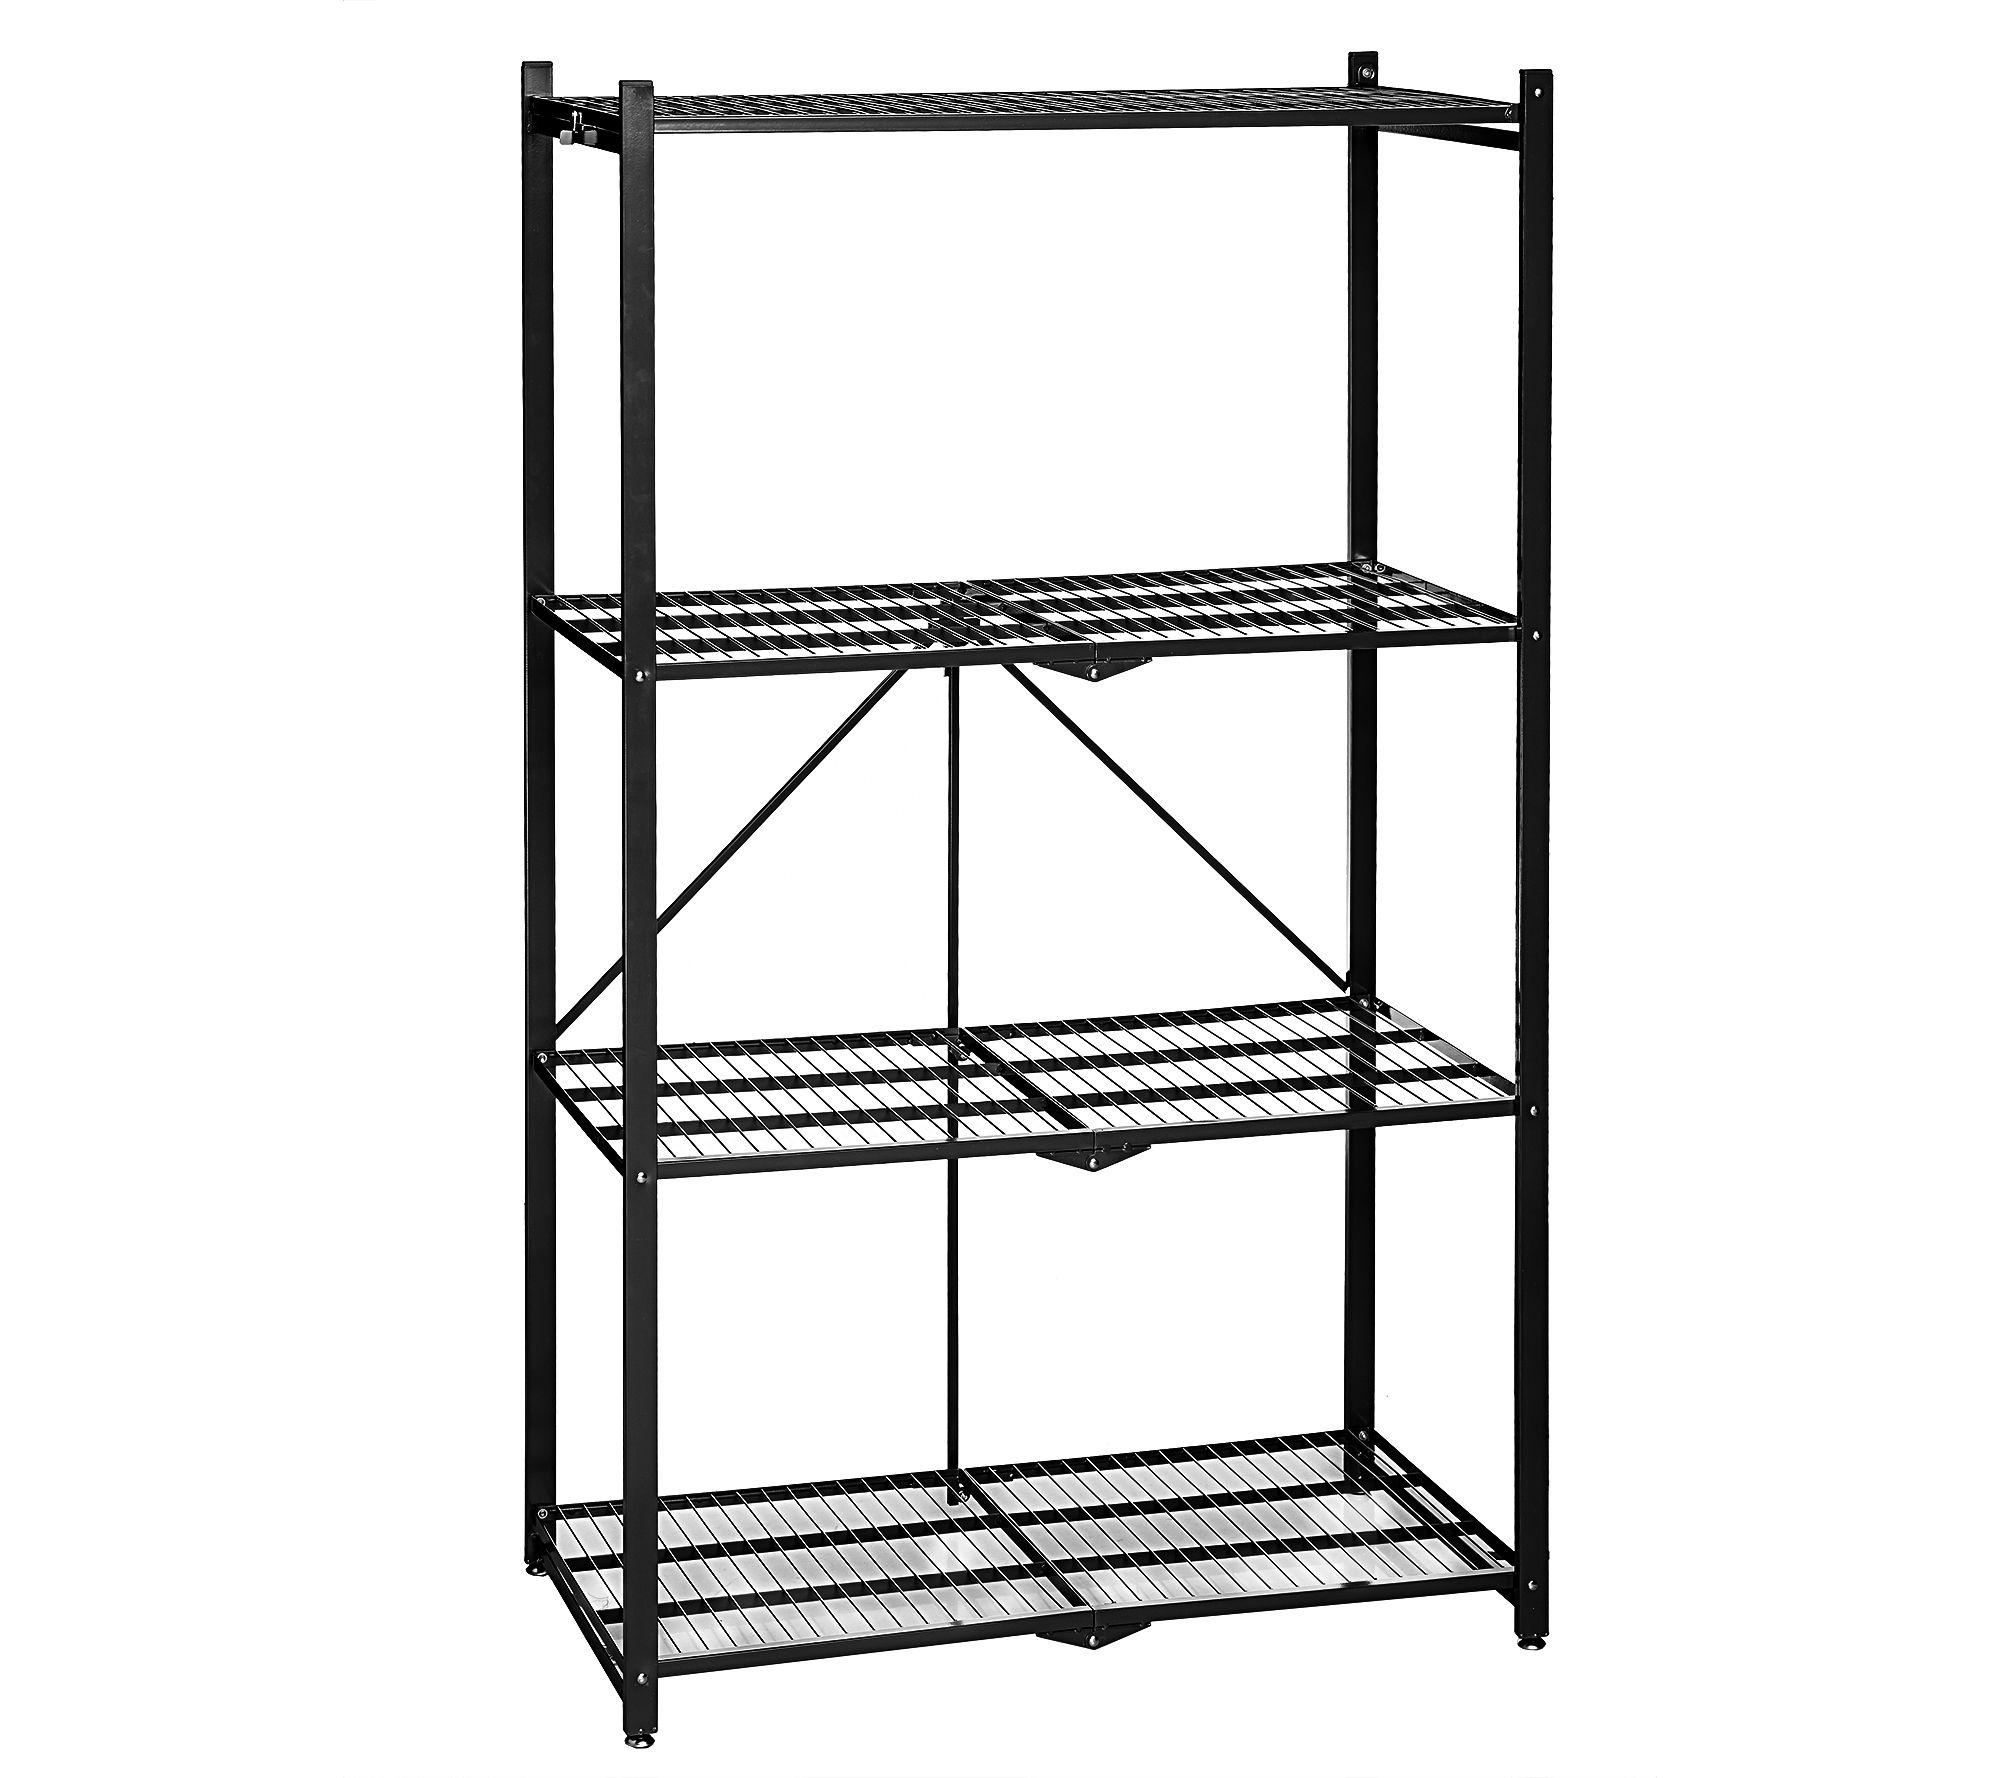 Fold Up Shelf Pop It 4 Tier Heavy Duty Collapsible Storage Shelf Page 1 Qvccom